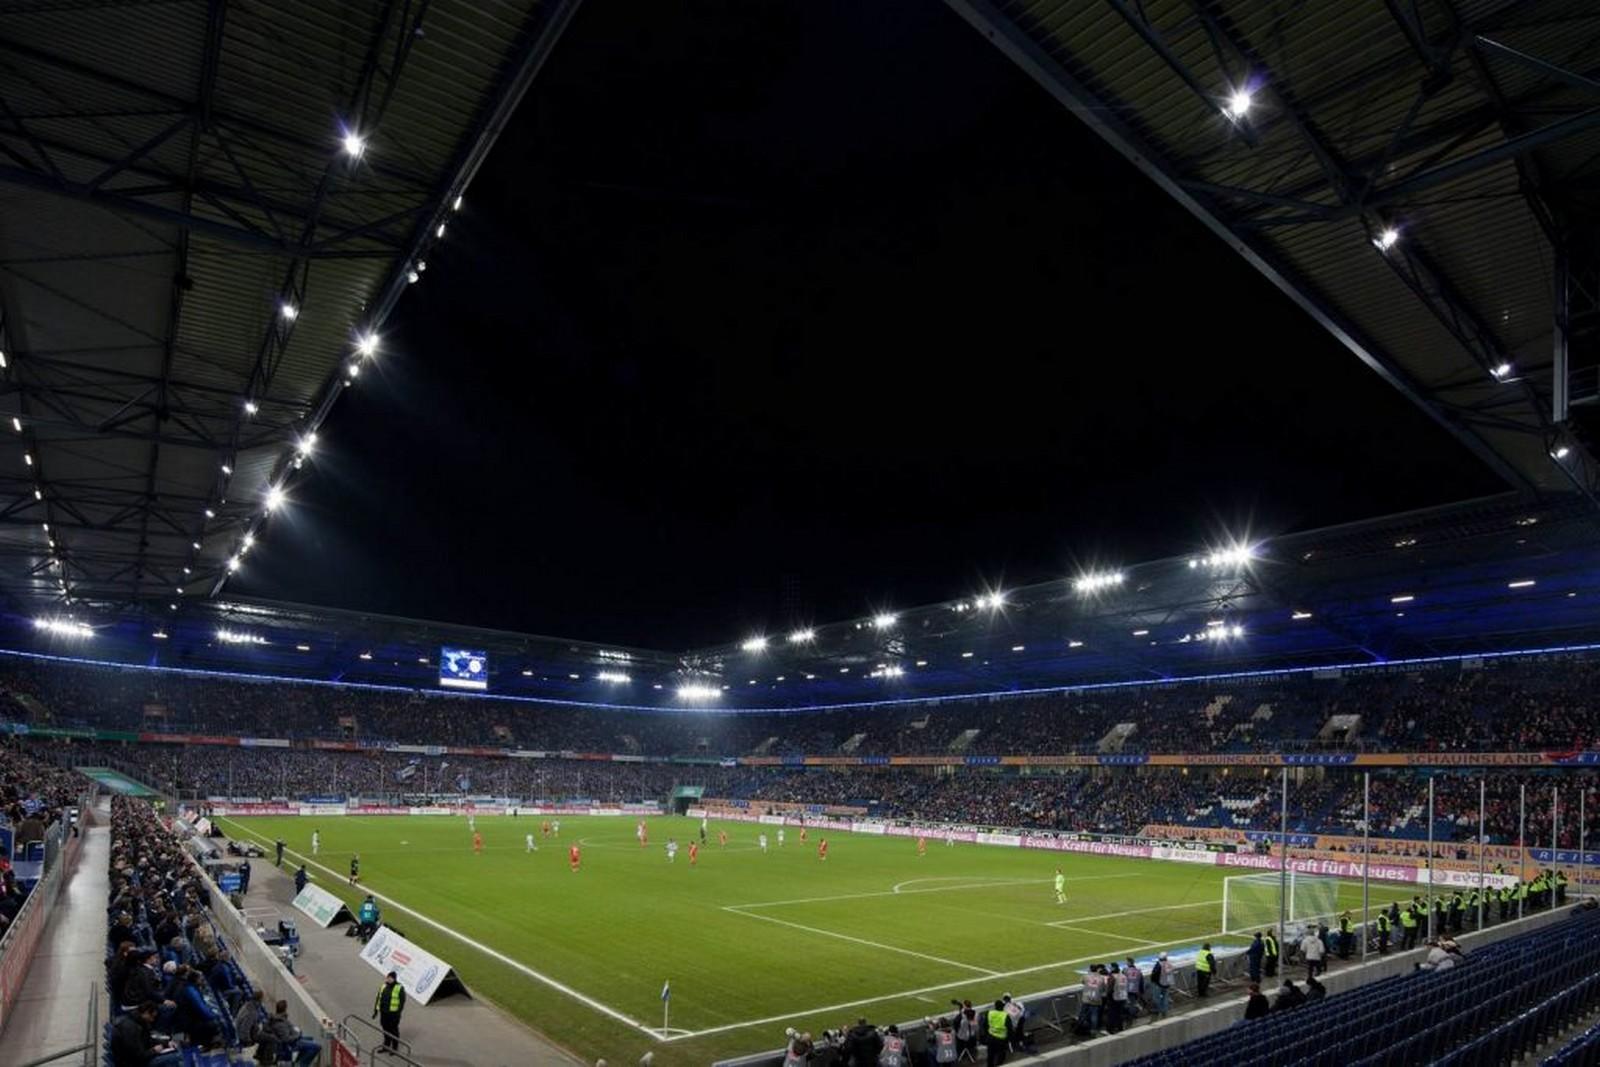 Stadion in Duisburg